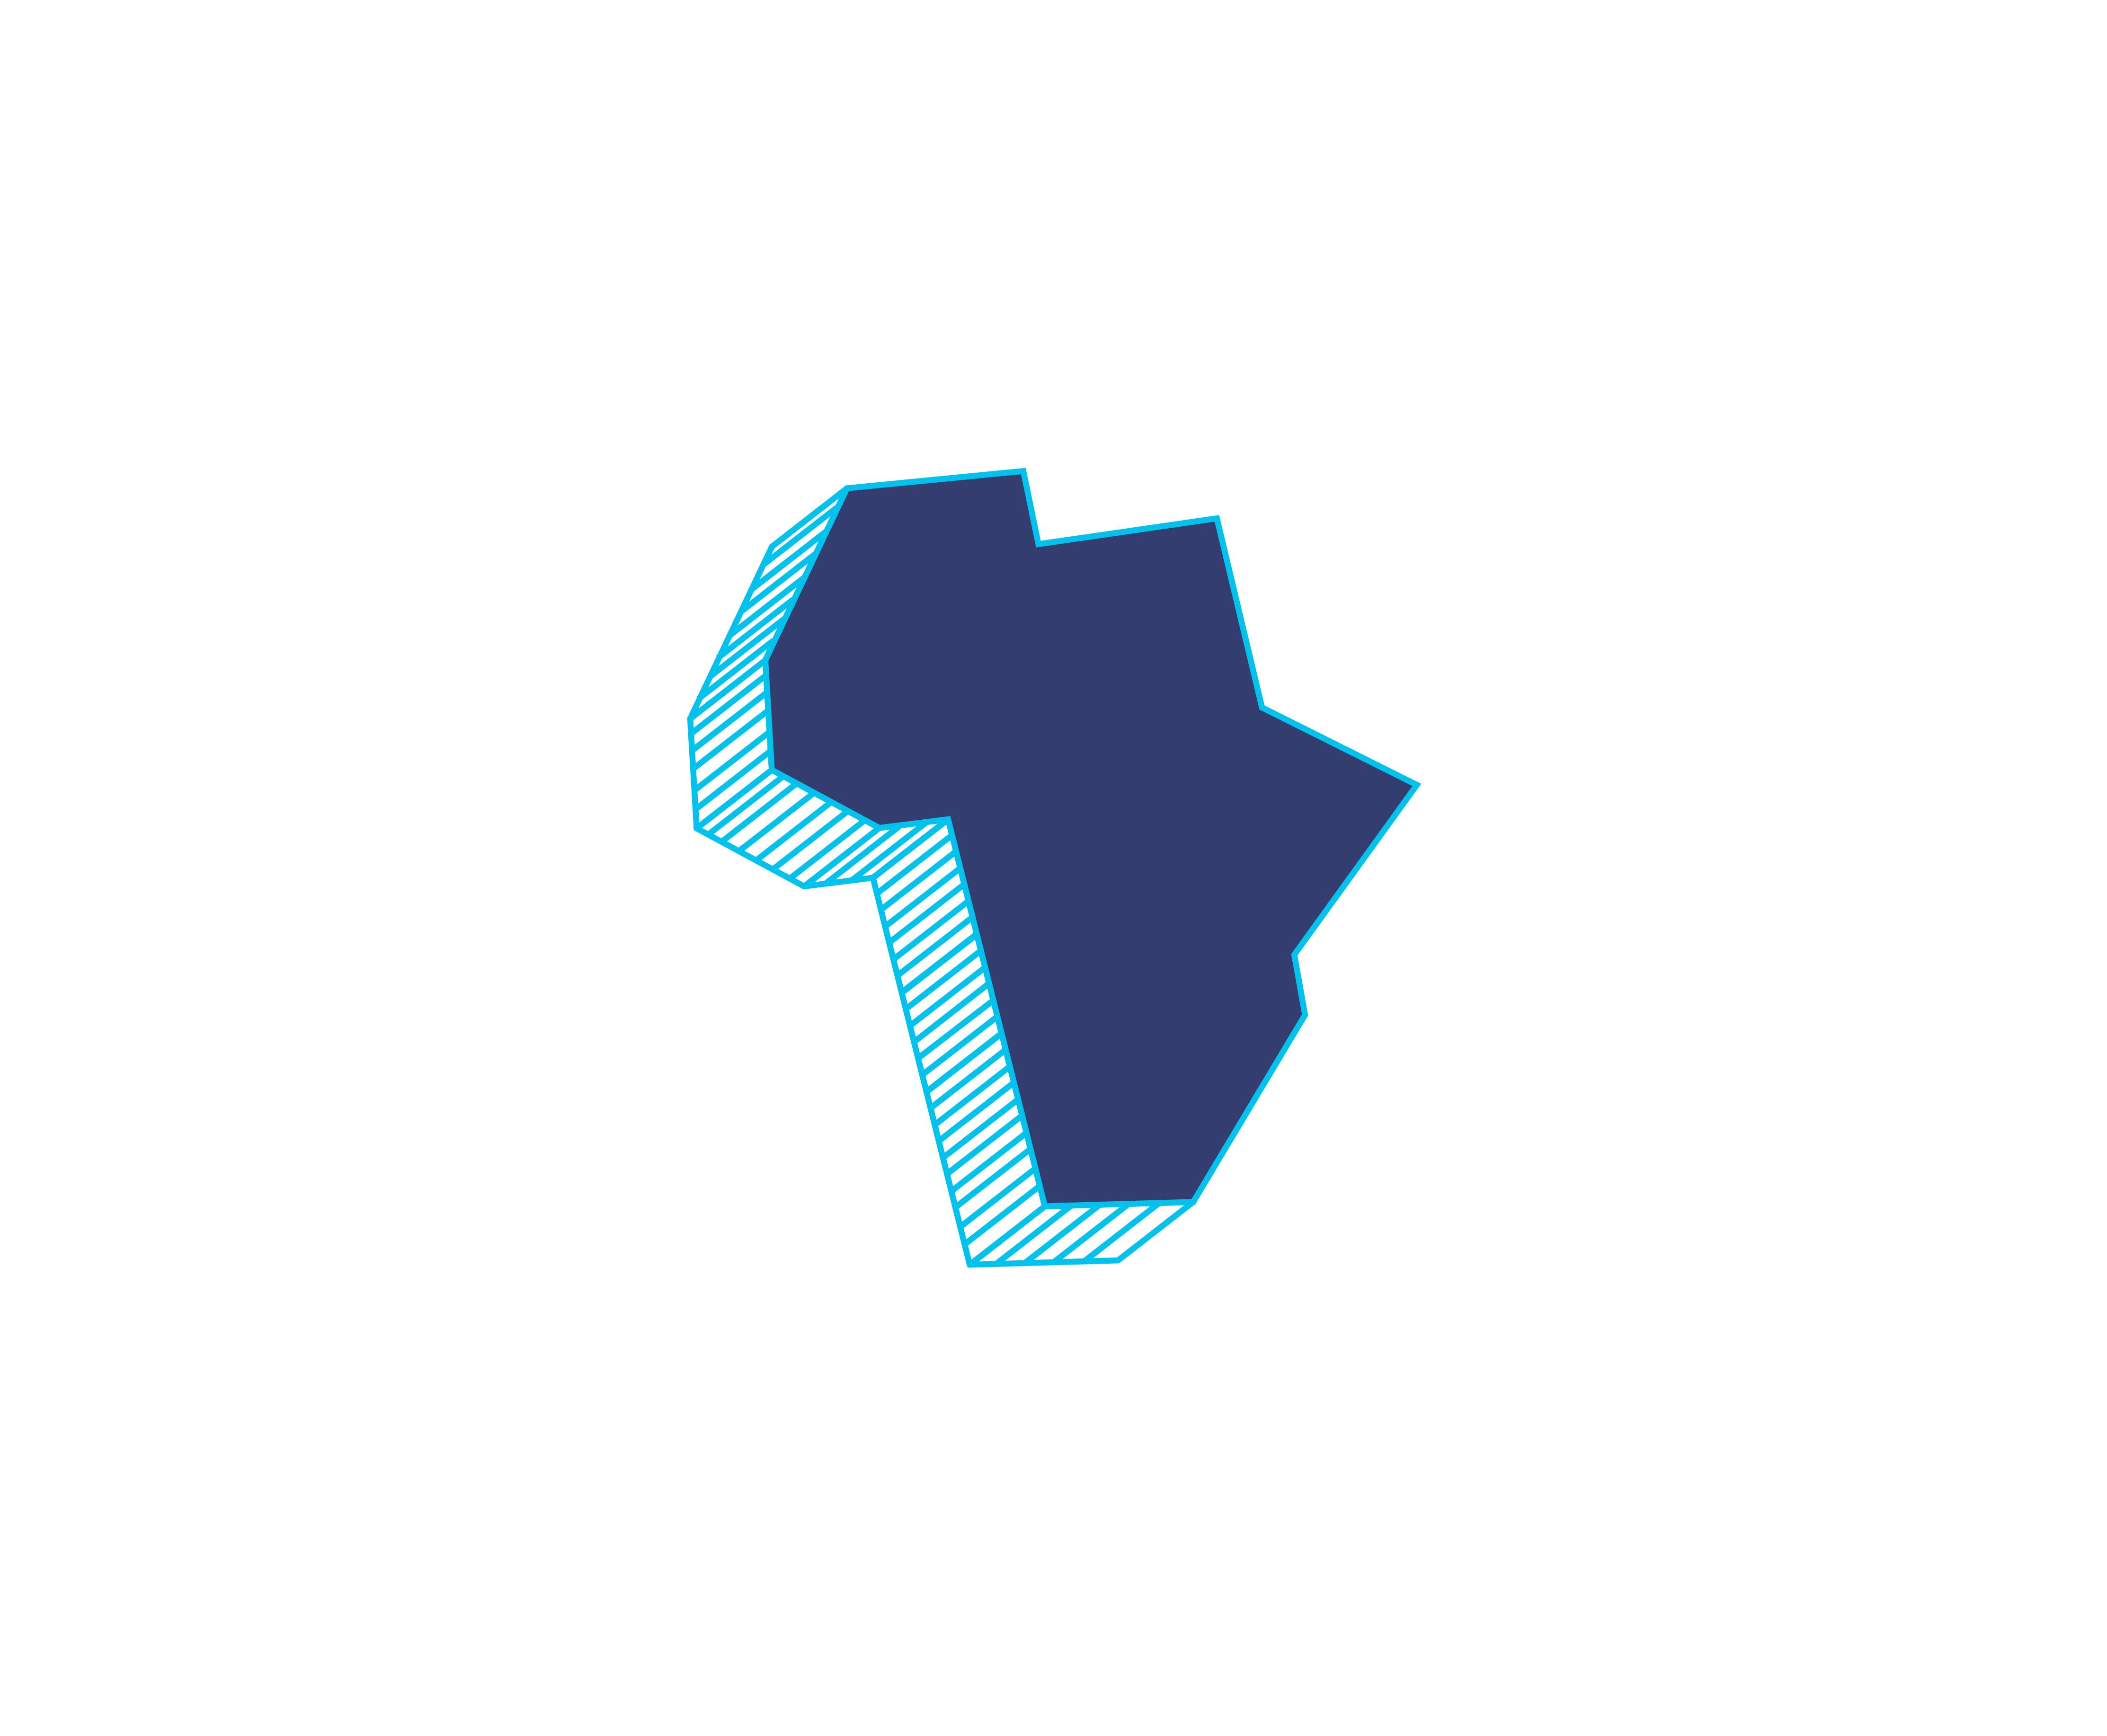 logos-for-sale-agent-orange-design-africa-depth.jpg